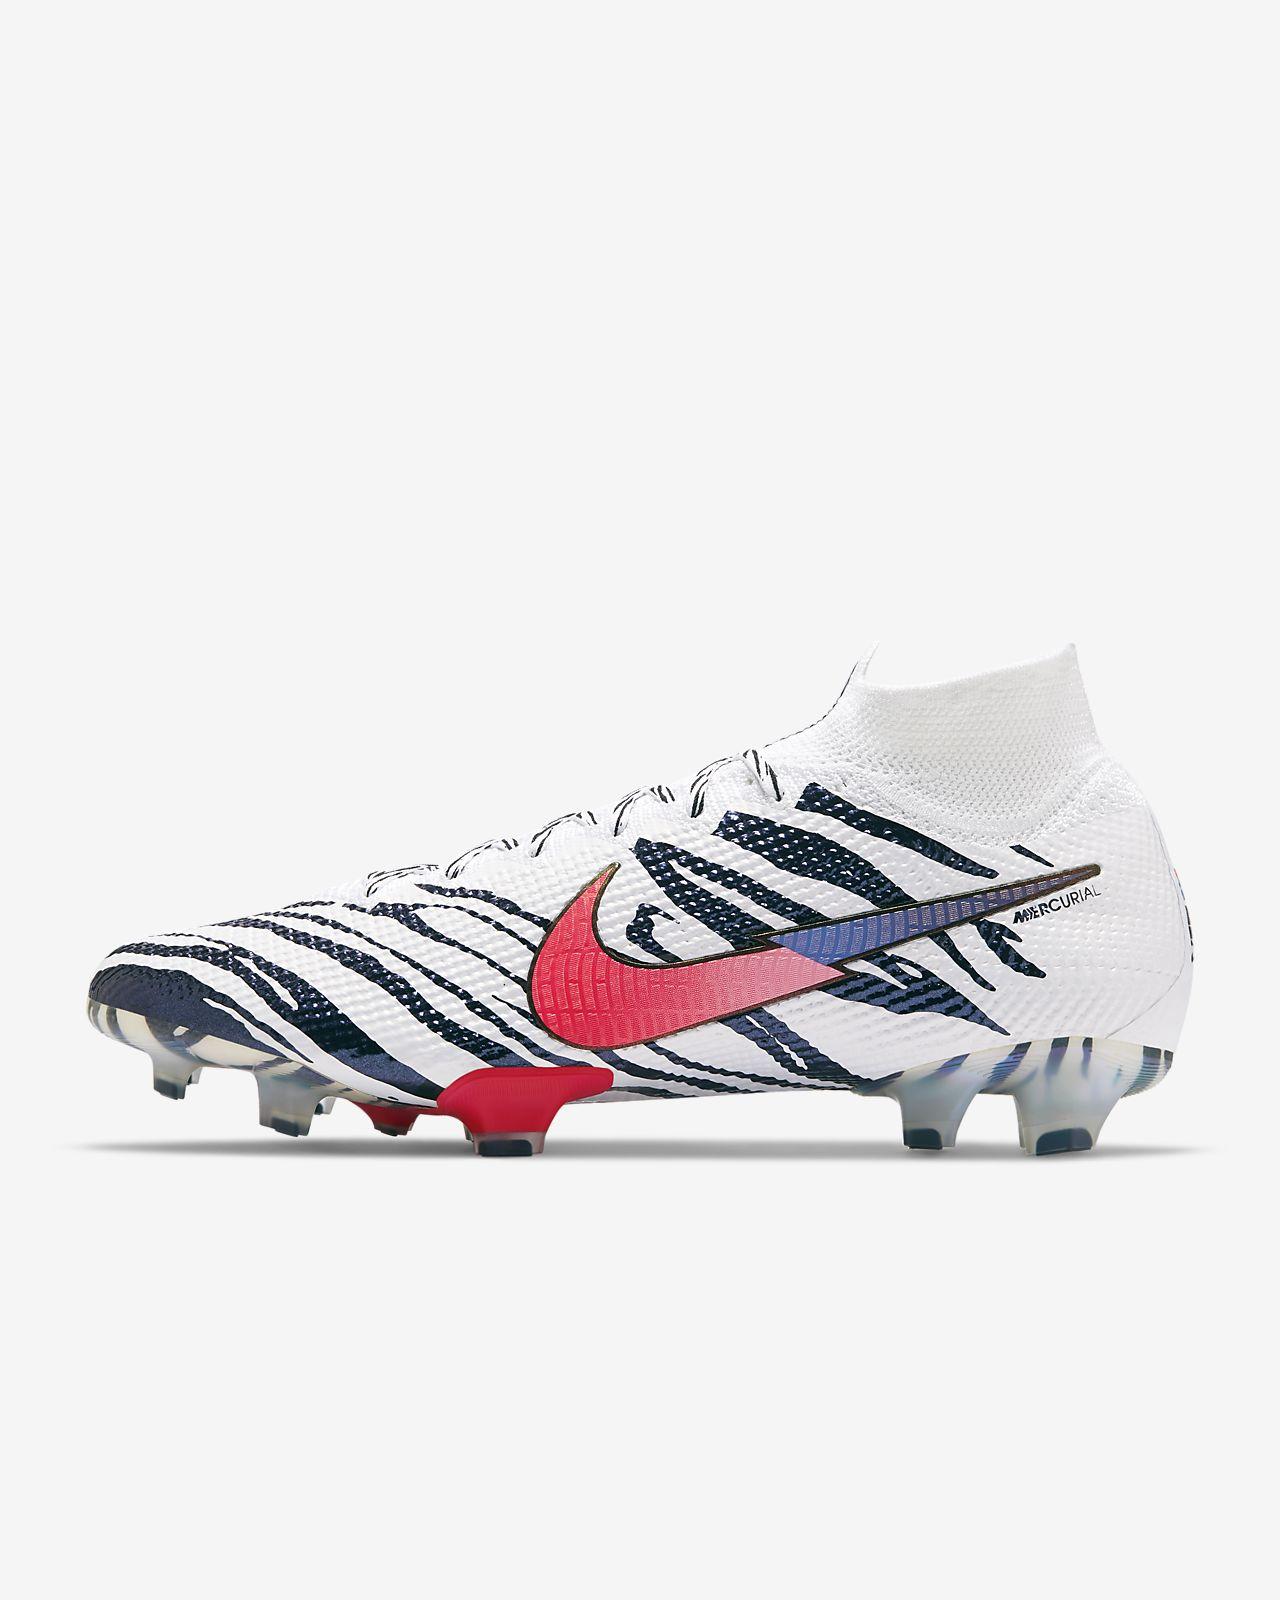 Nike Mercurial Superfly FG Pink Cr7 Cristiano Ronaldo Mens .